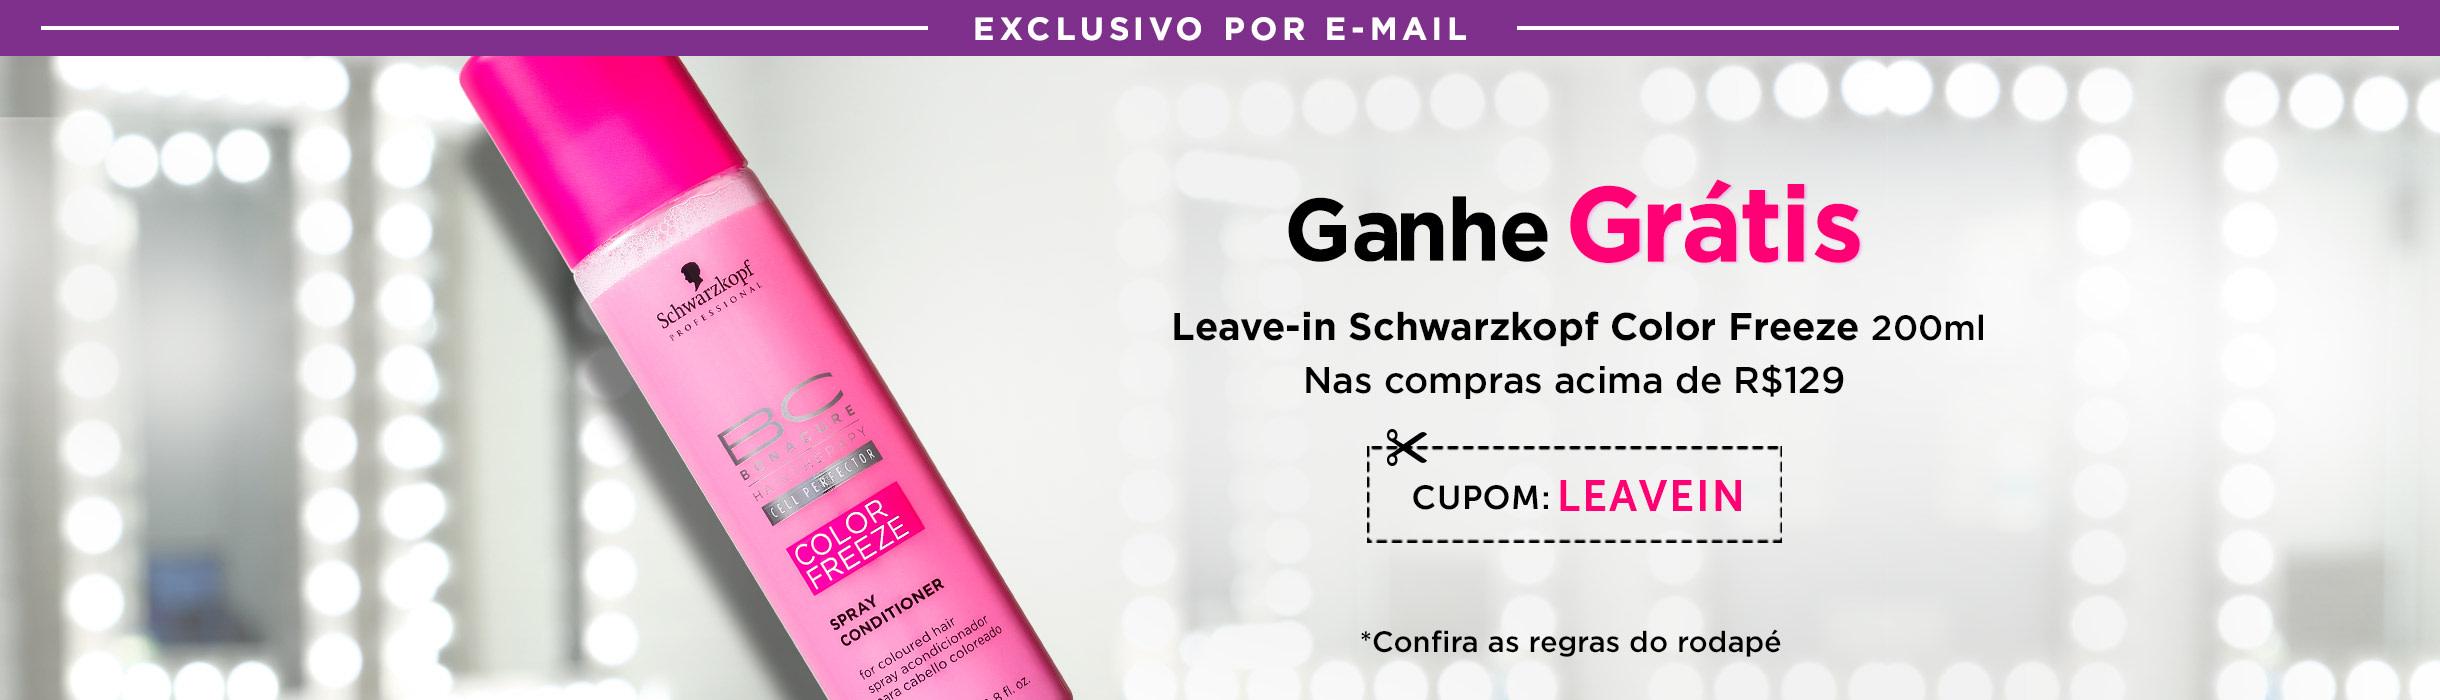 Ganhe Leave-in Schwarzkopf